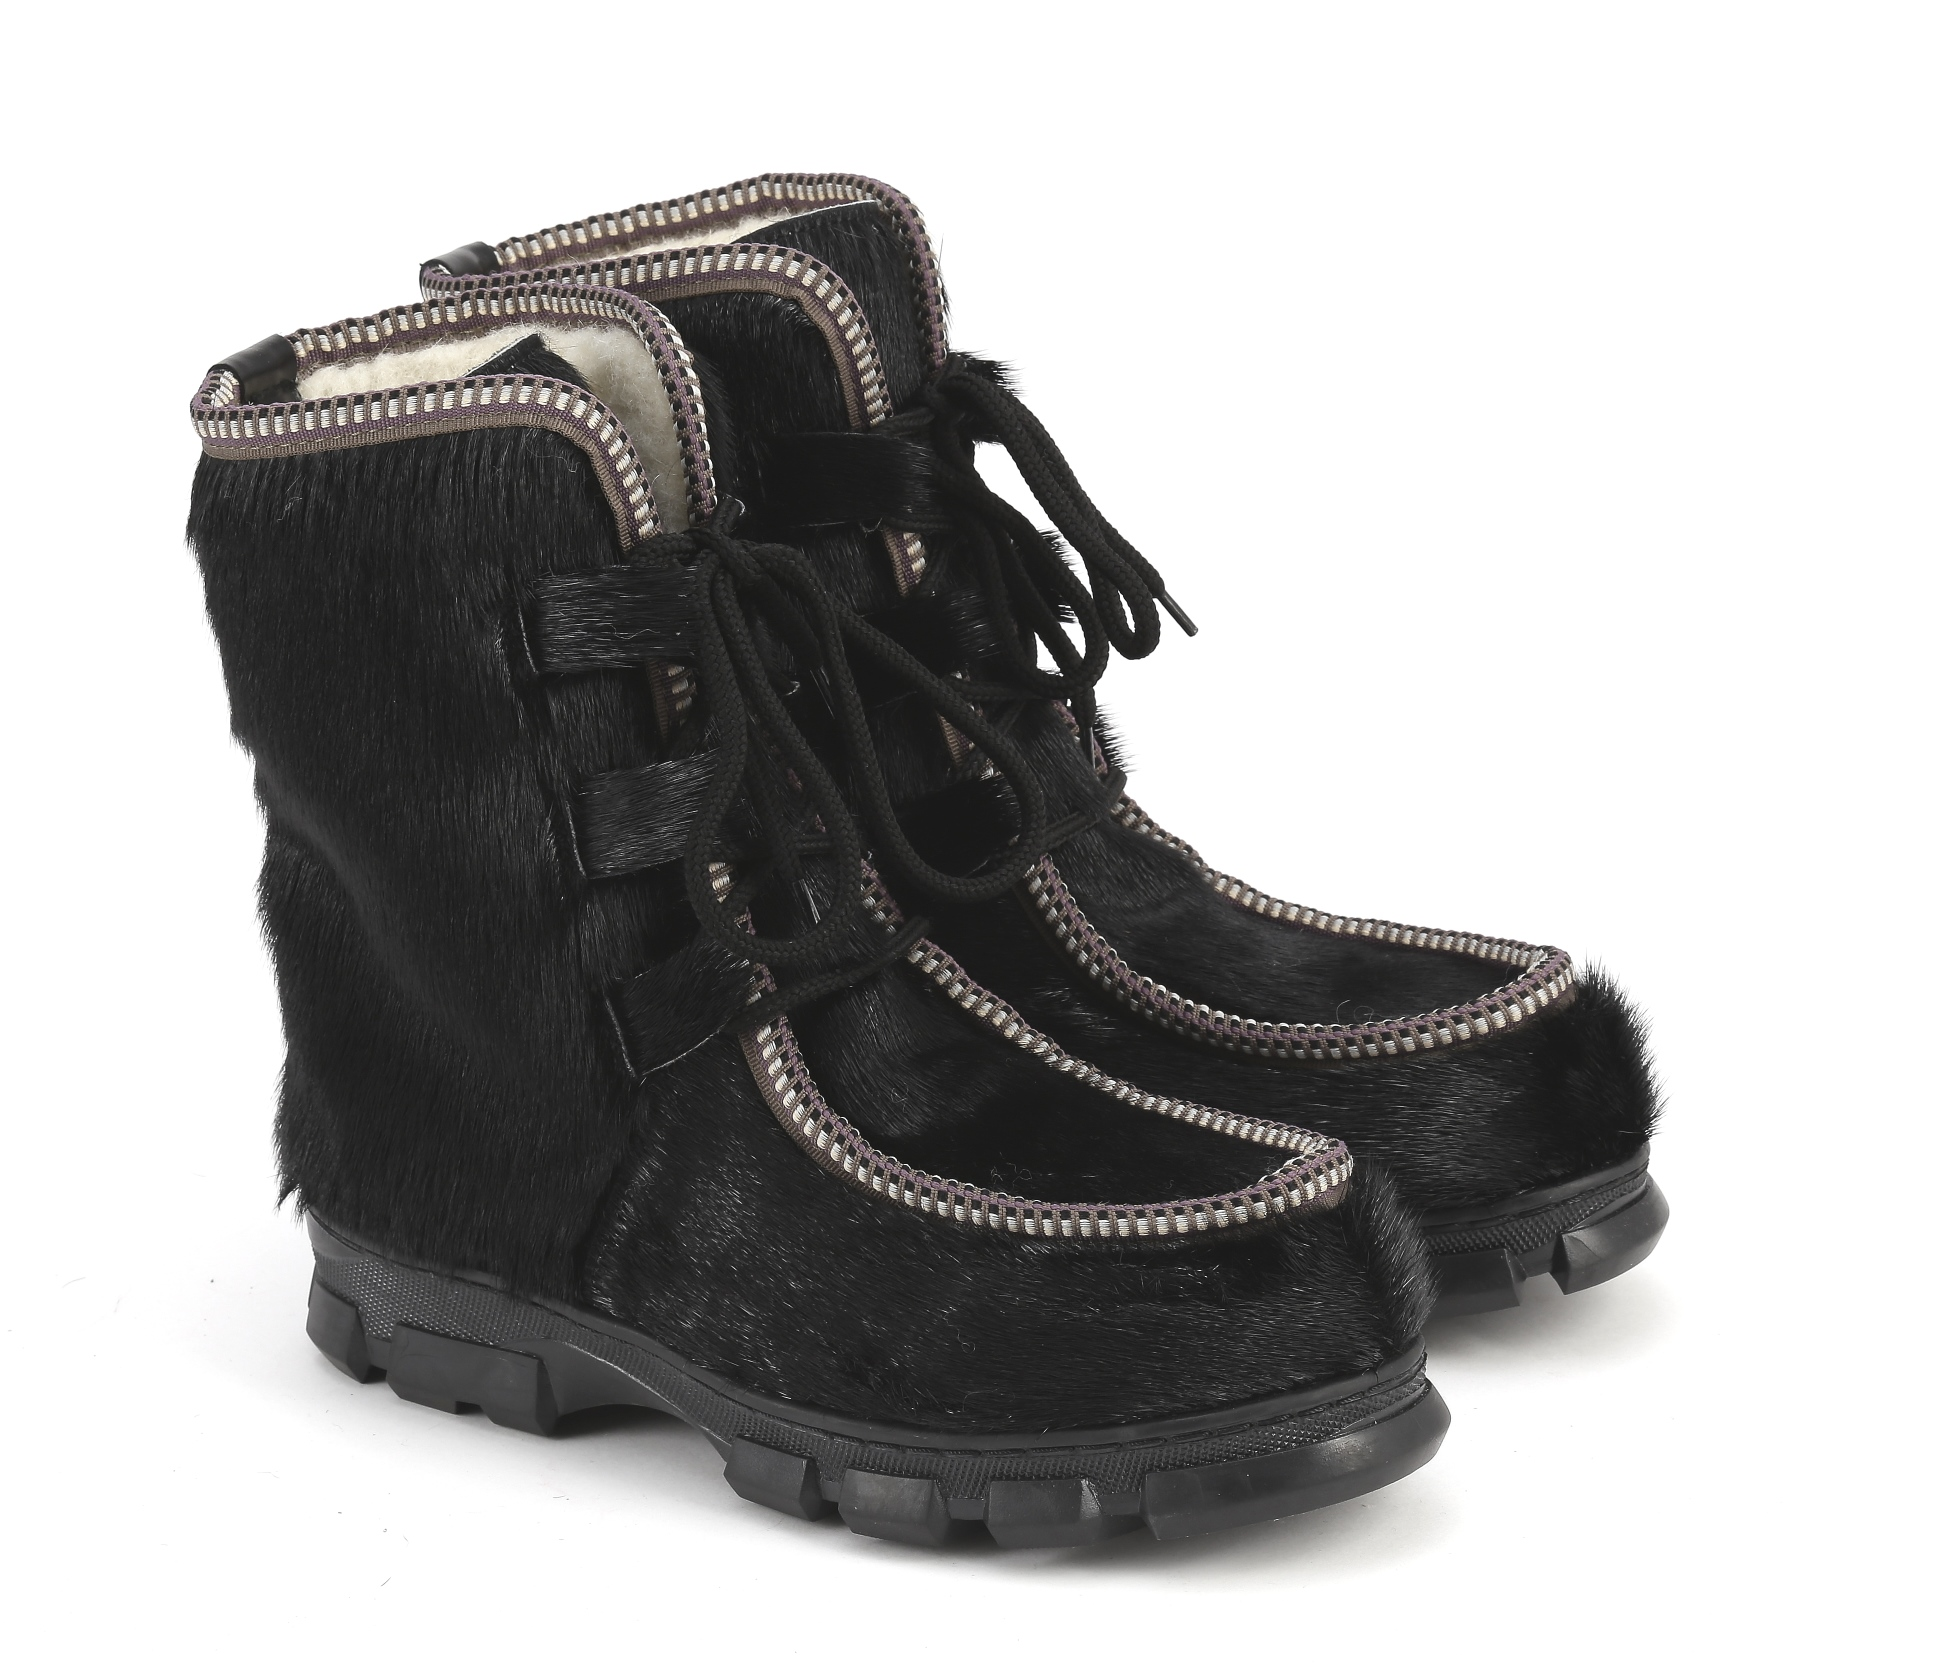 Обувь зимняя, EthnoBoot, black, size 36